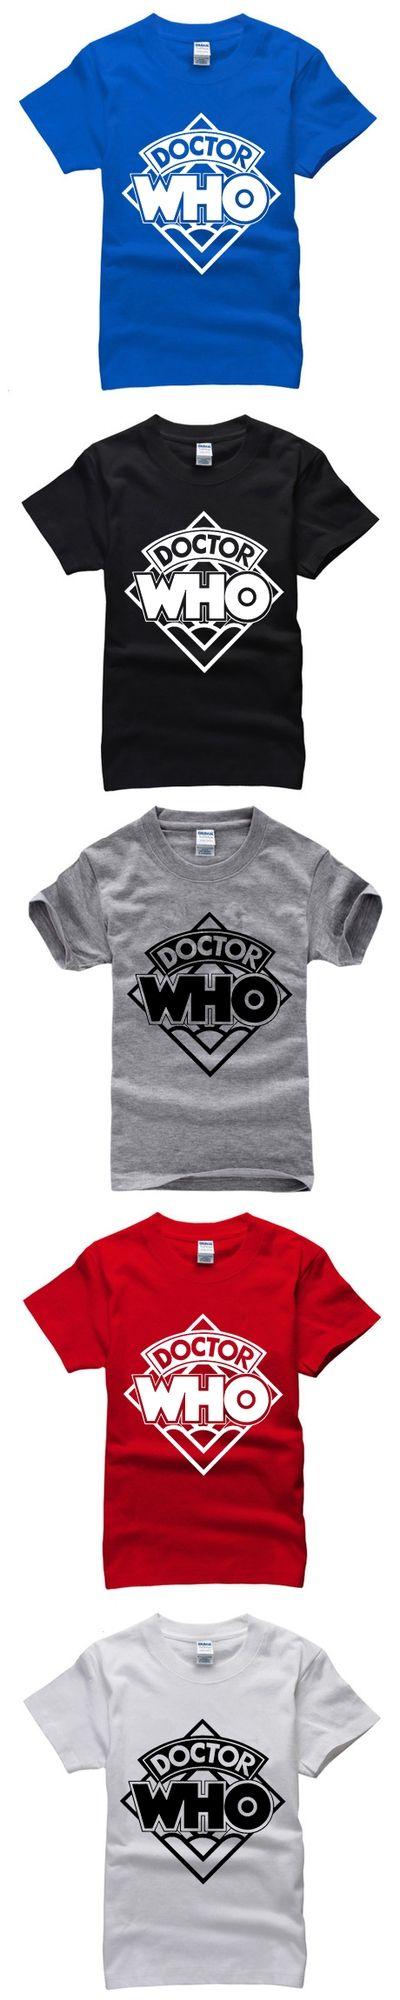 2015 New Design Minions Police Box Doctor Who mens t shirts Fashion Cartoon Anime Short Sleeve Tee Shirts Tops Plus Size